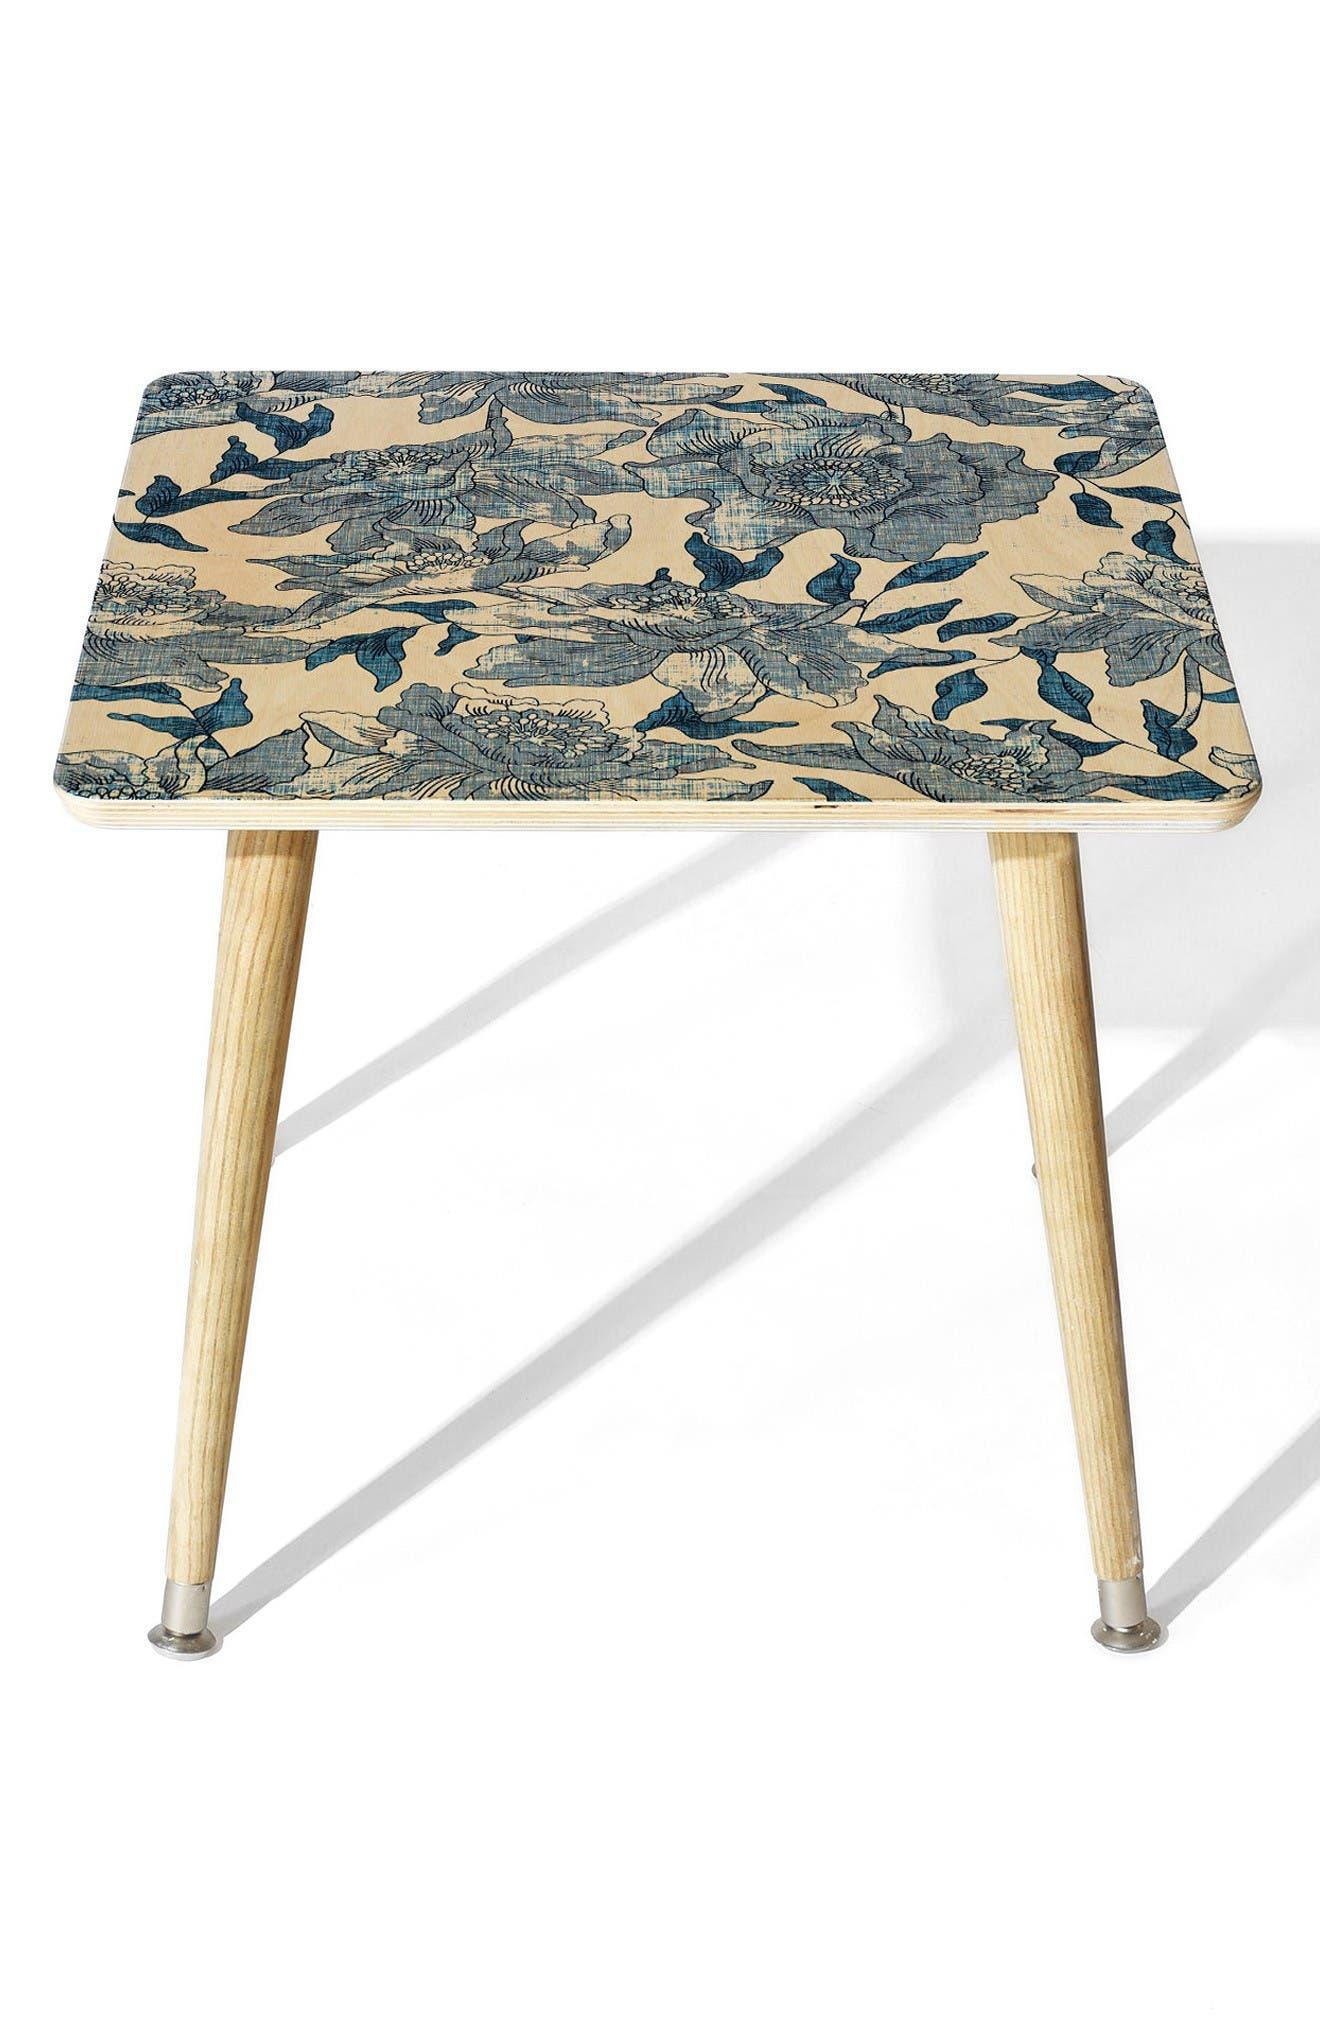 Main Image - Deny Designs Summertime Indigo Side Table